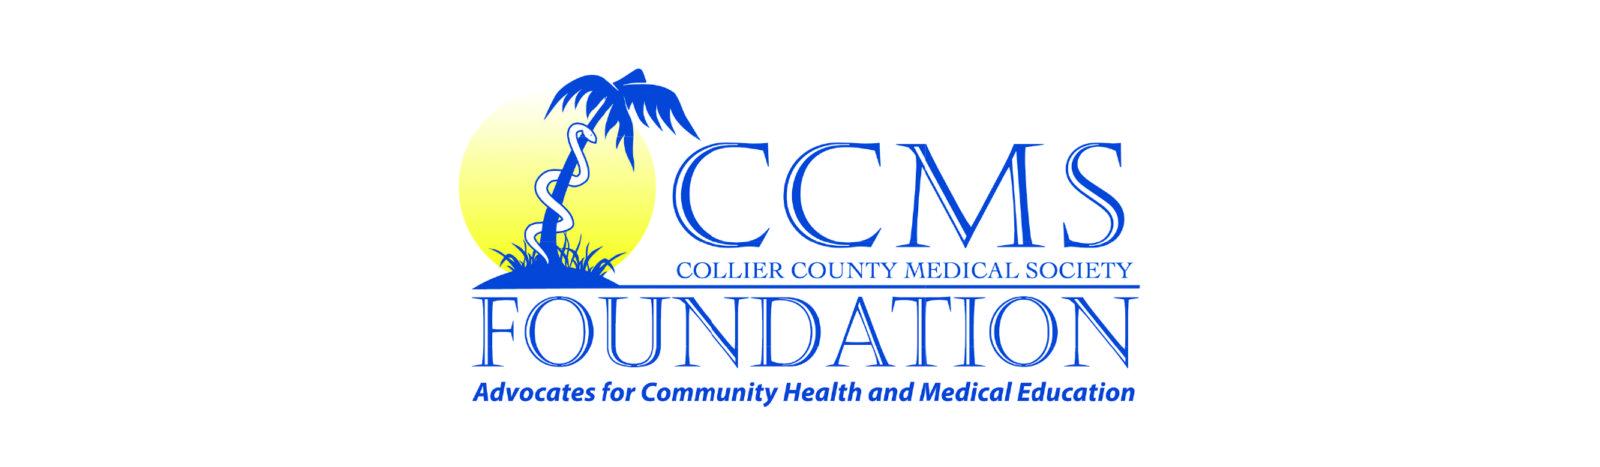 fccms-logo-for-web-banner2